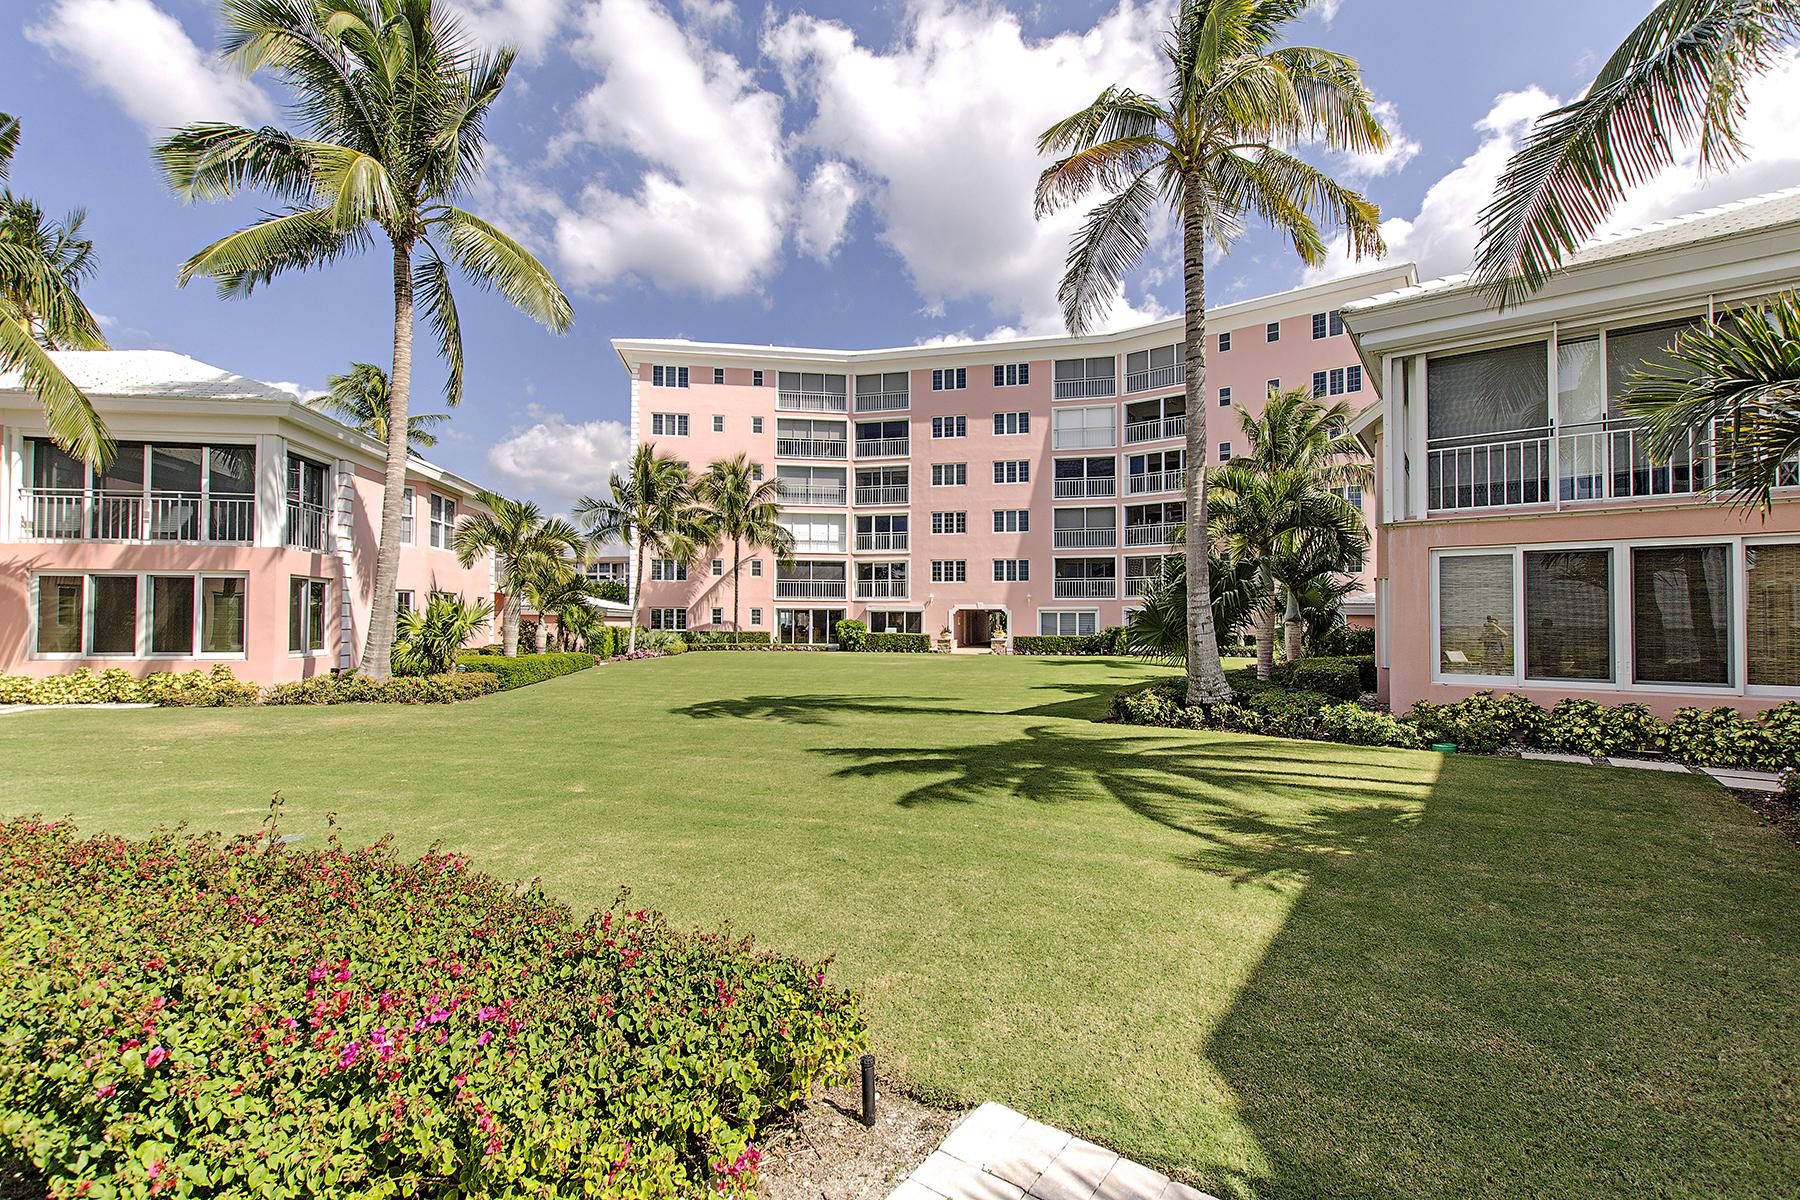 Condominium for Sale at THE MOORINGS - SHORES OF NAPLES 2401 Gulf Shore Blvd N 44 Naples, Florida 34103 United States